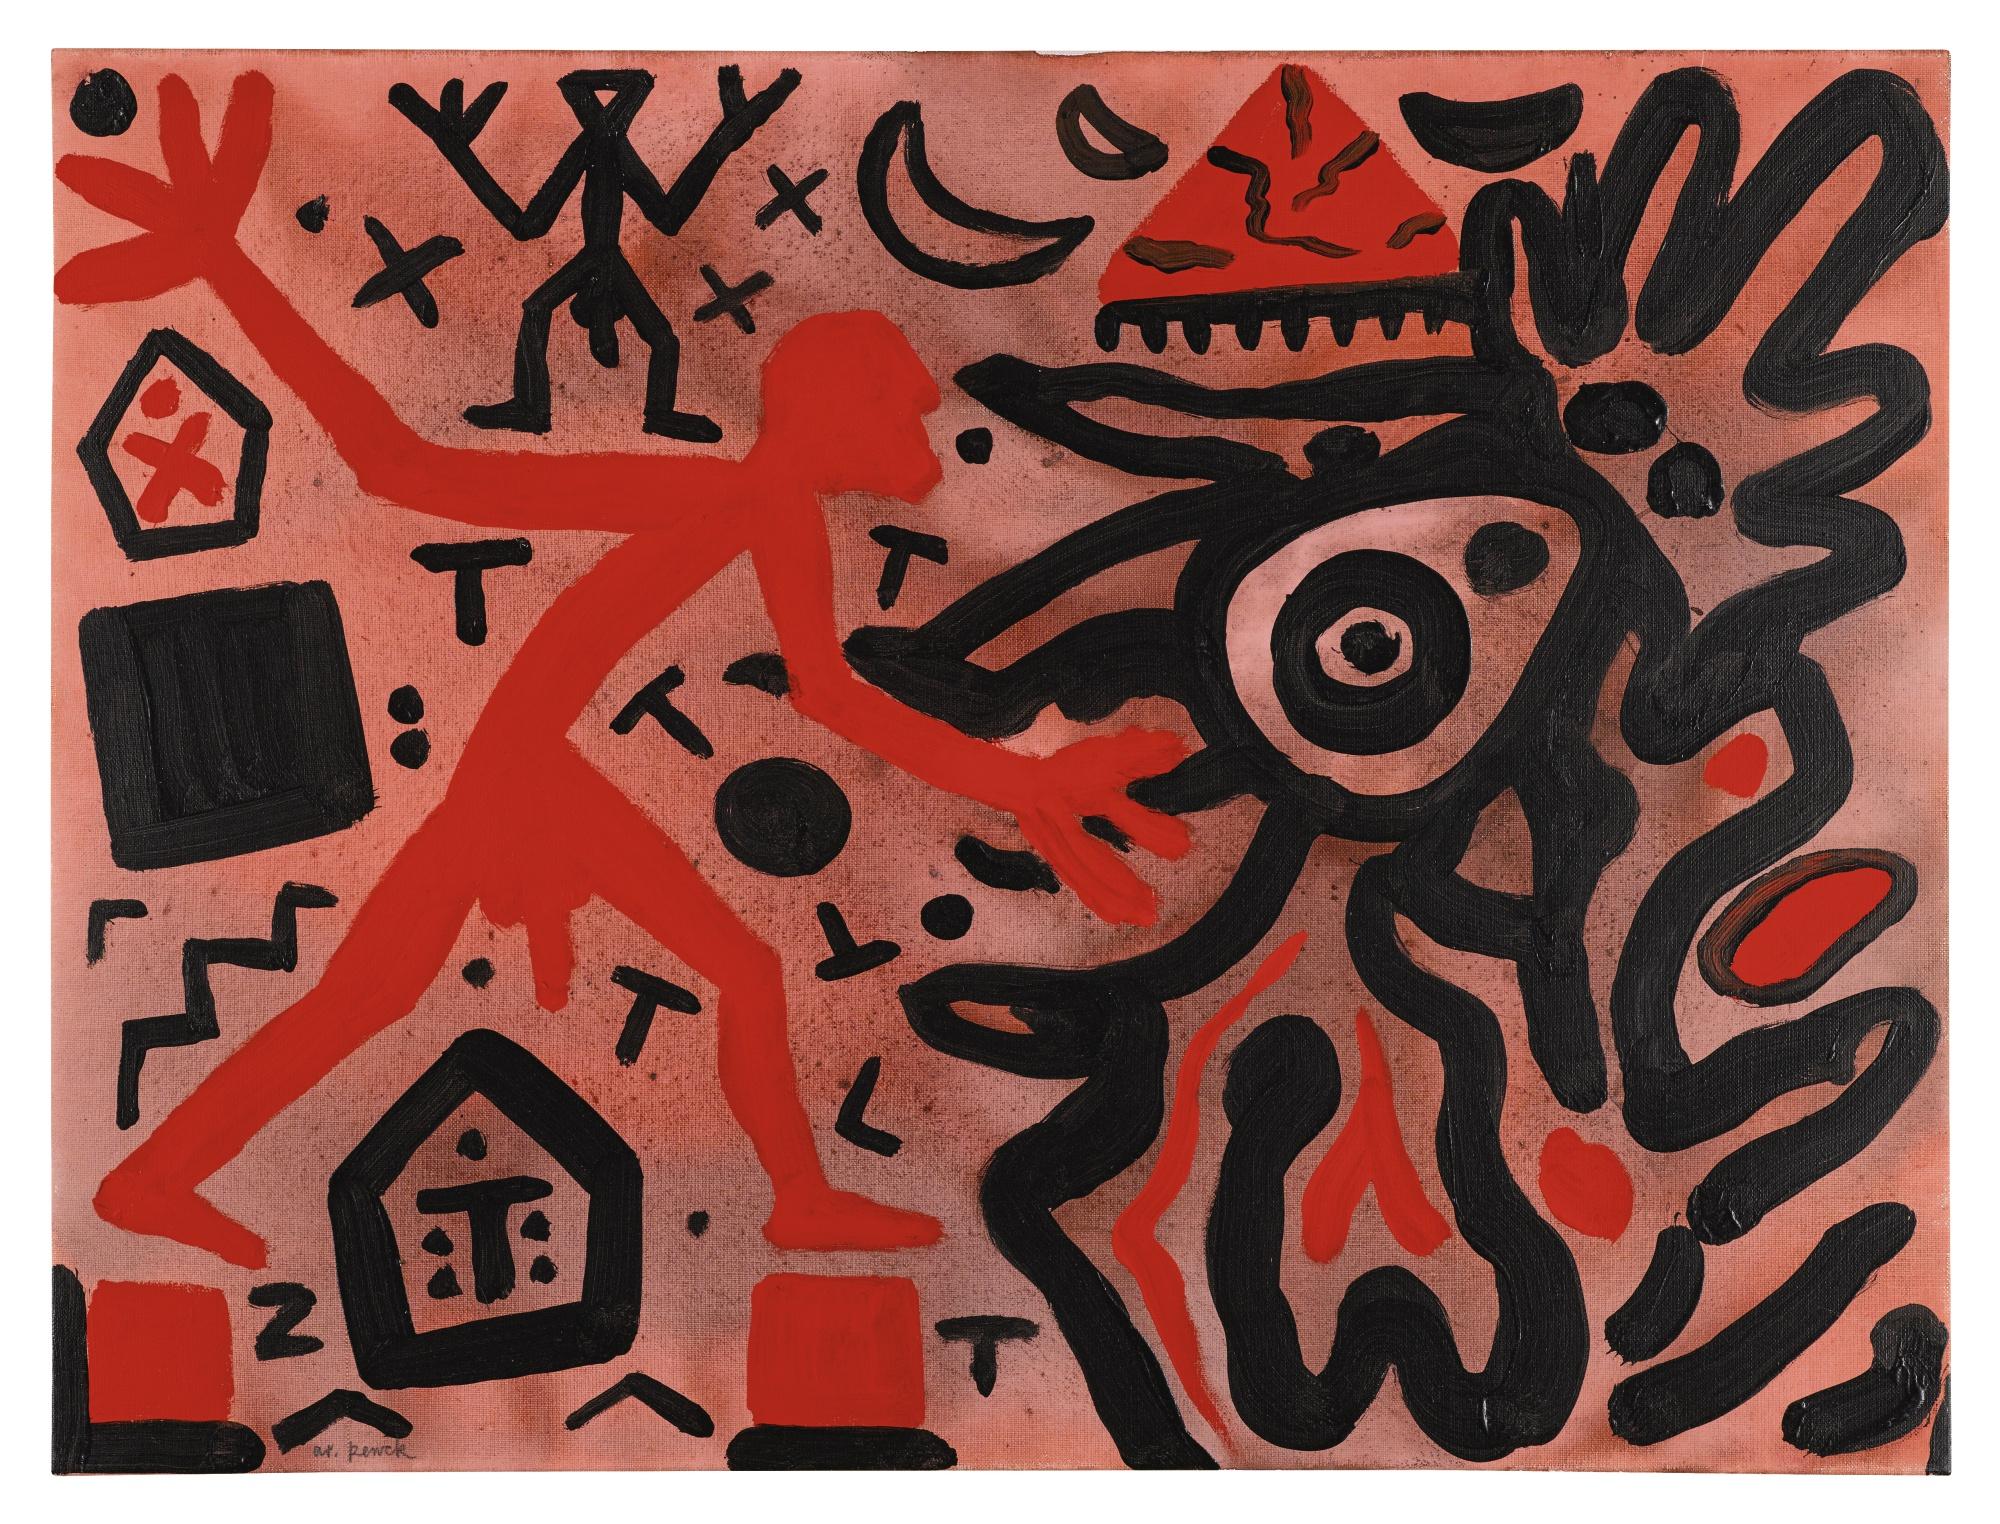 A.R. Penck-Lava - Feedback-1998